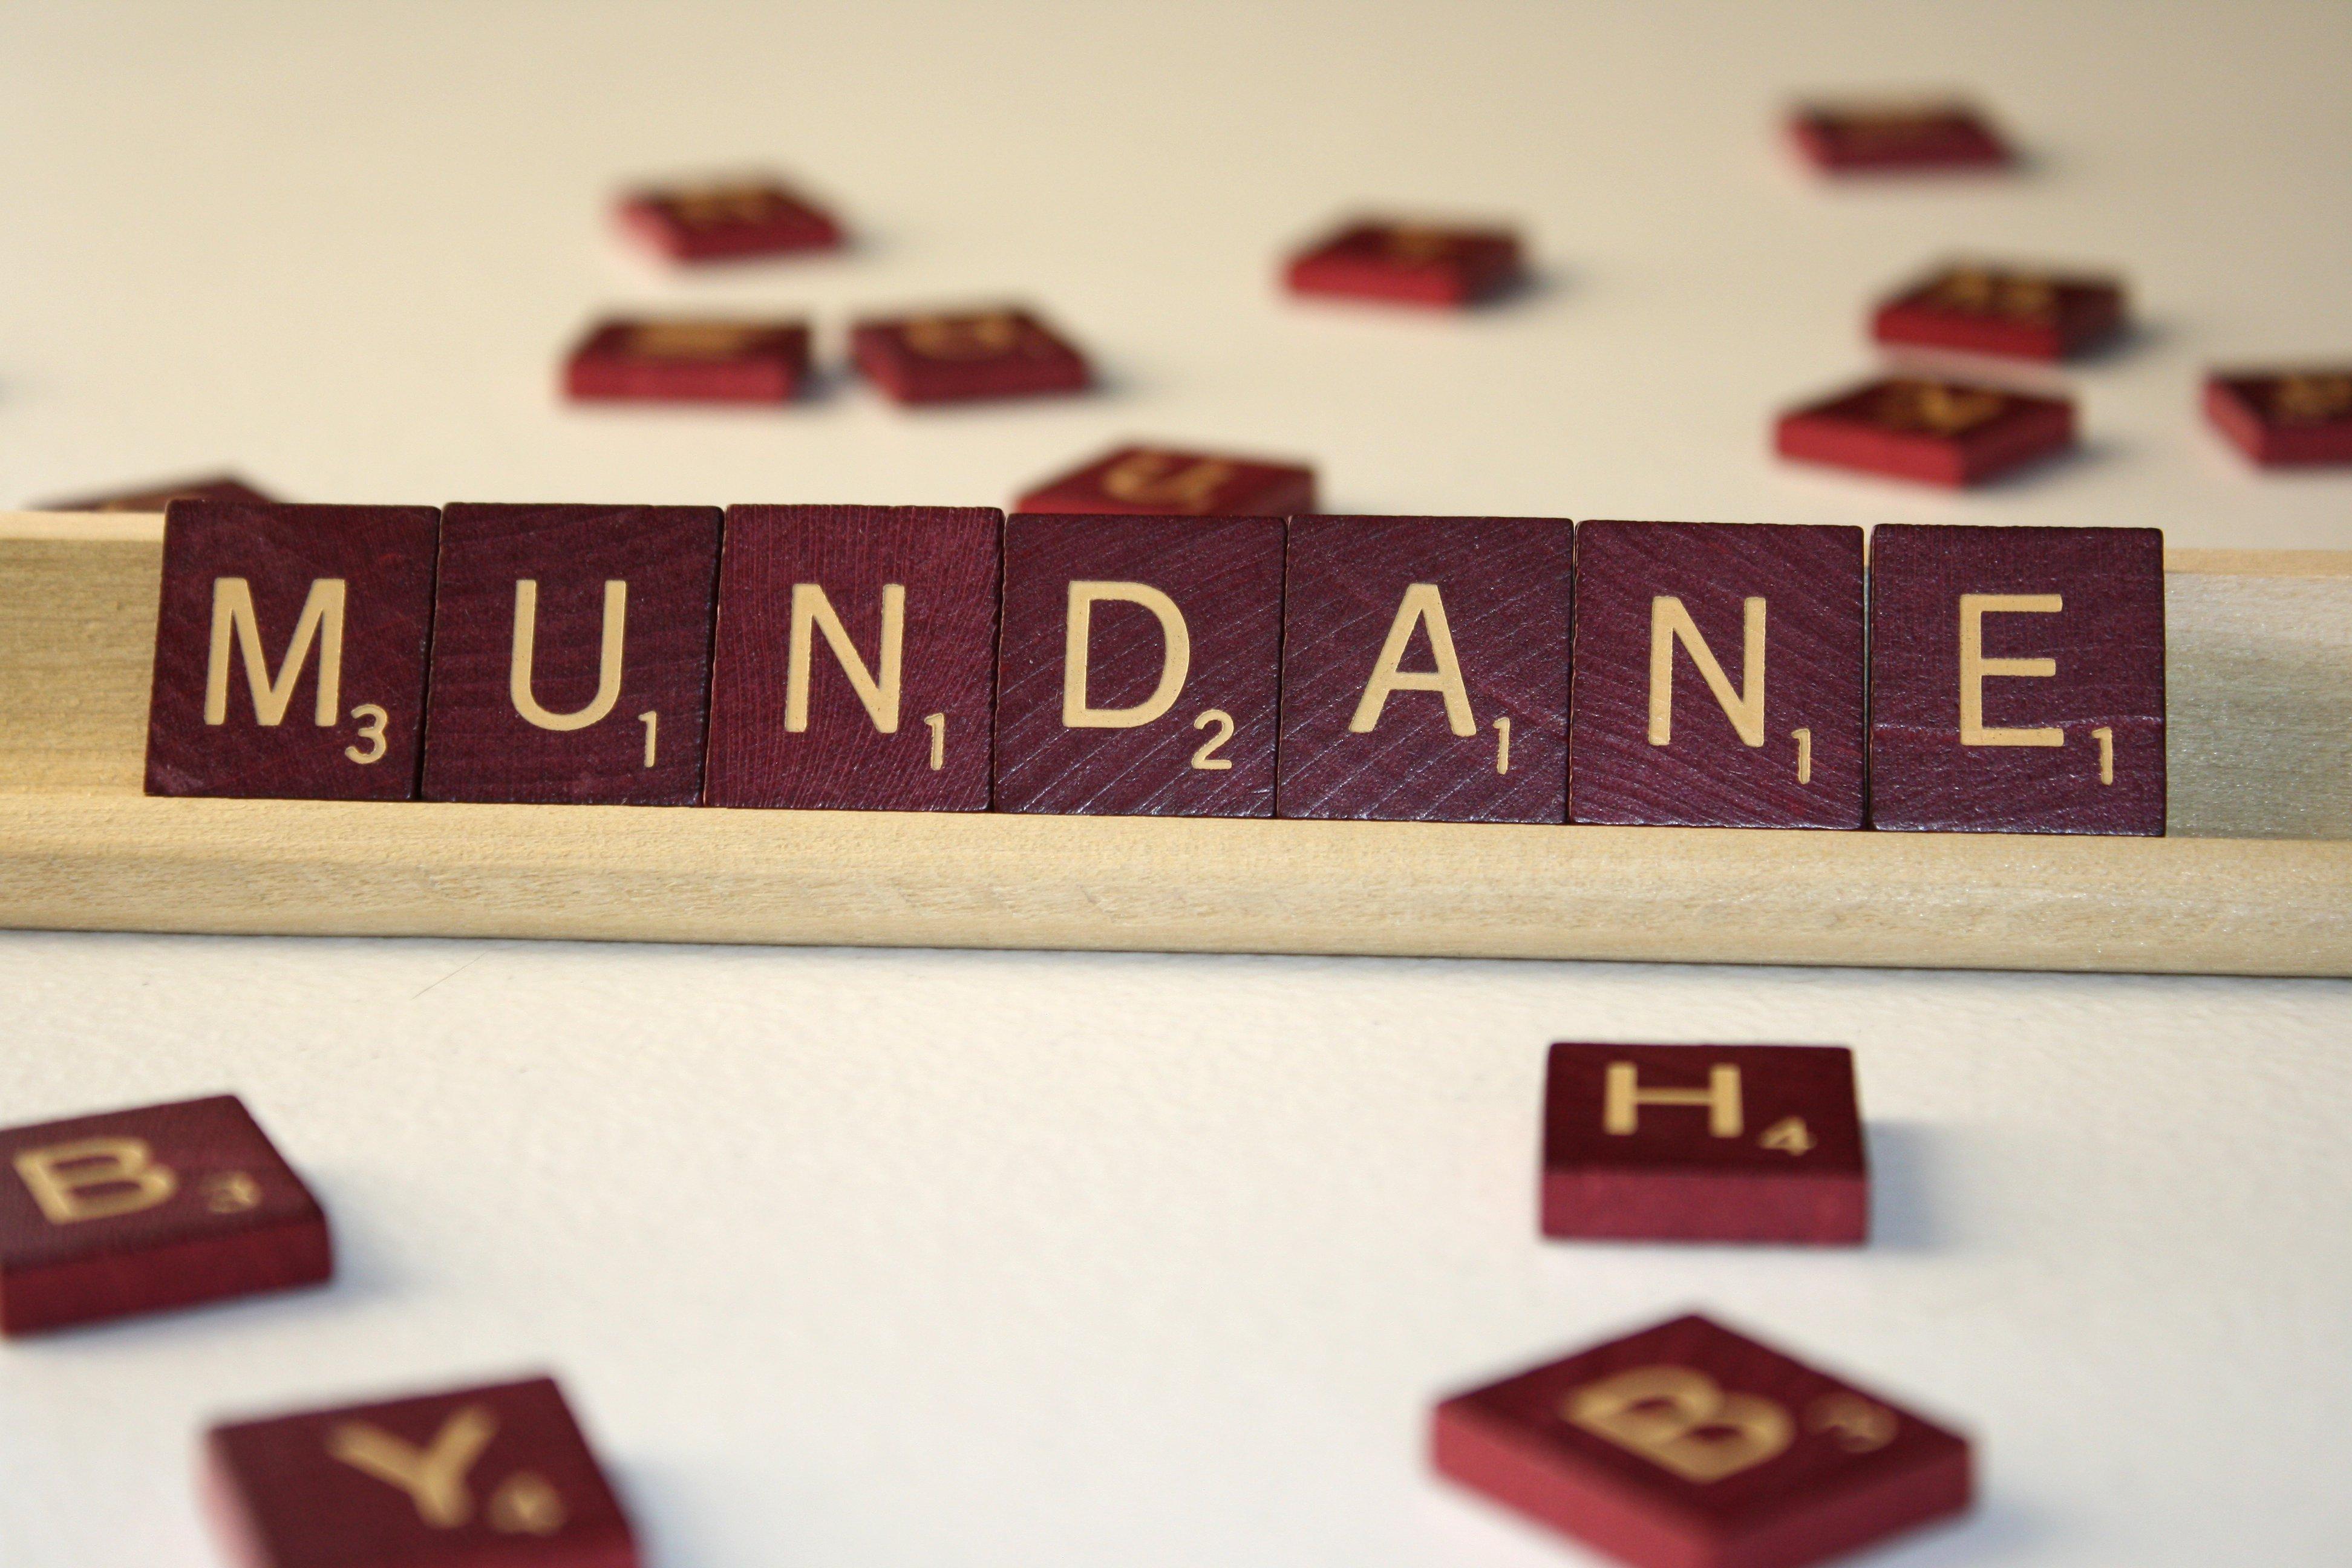 Mundane ERP systems